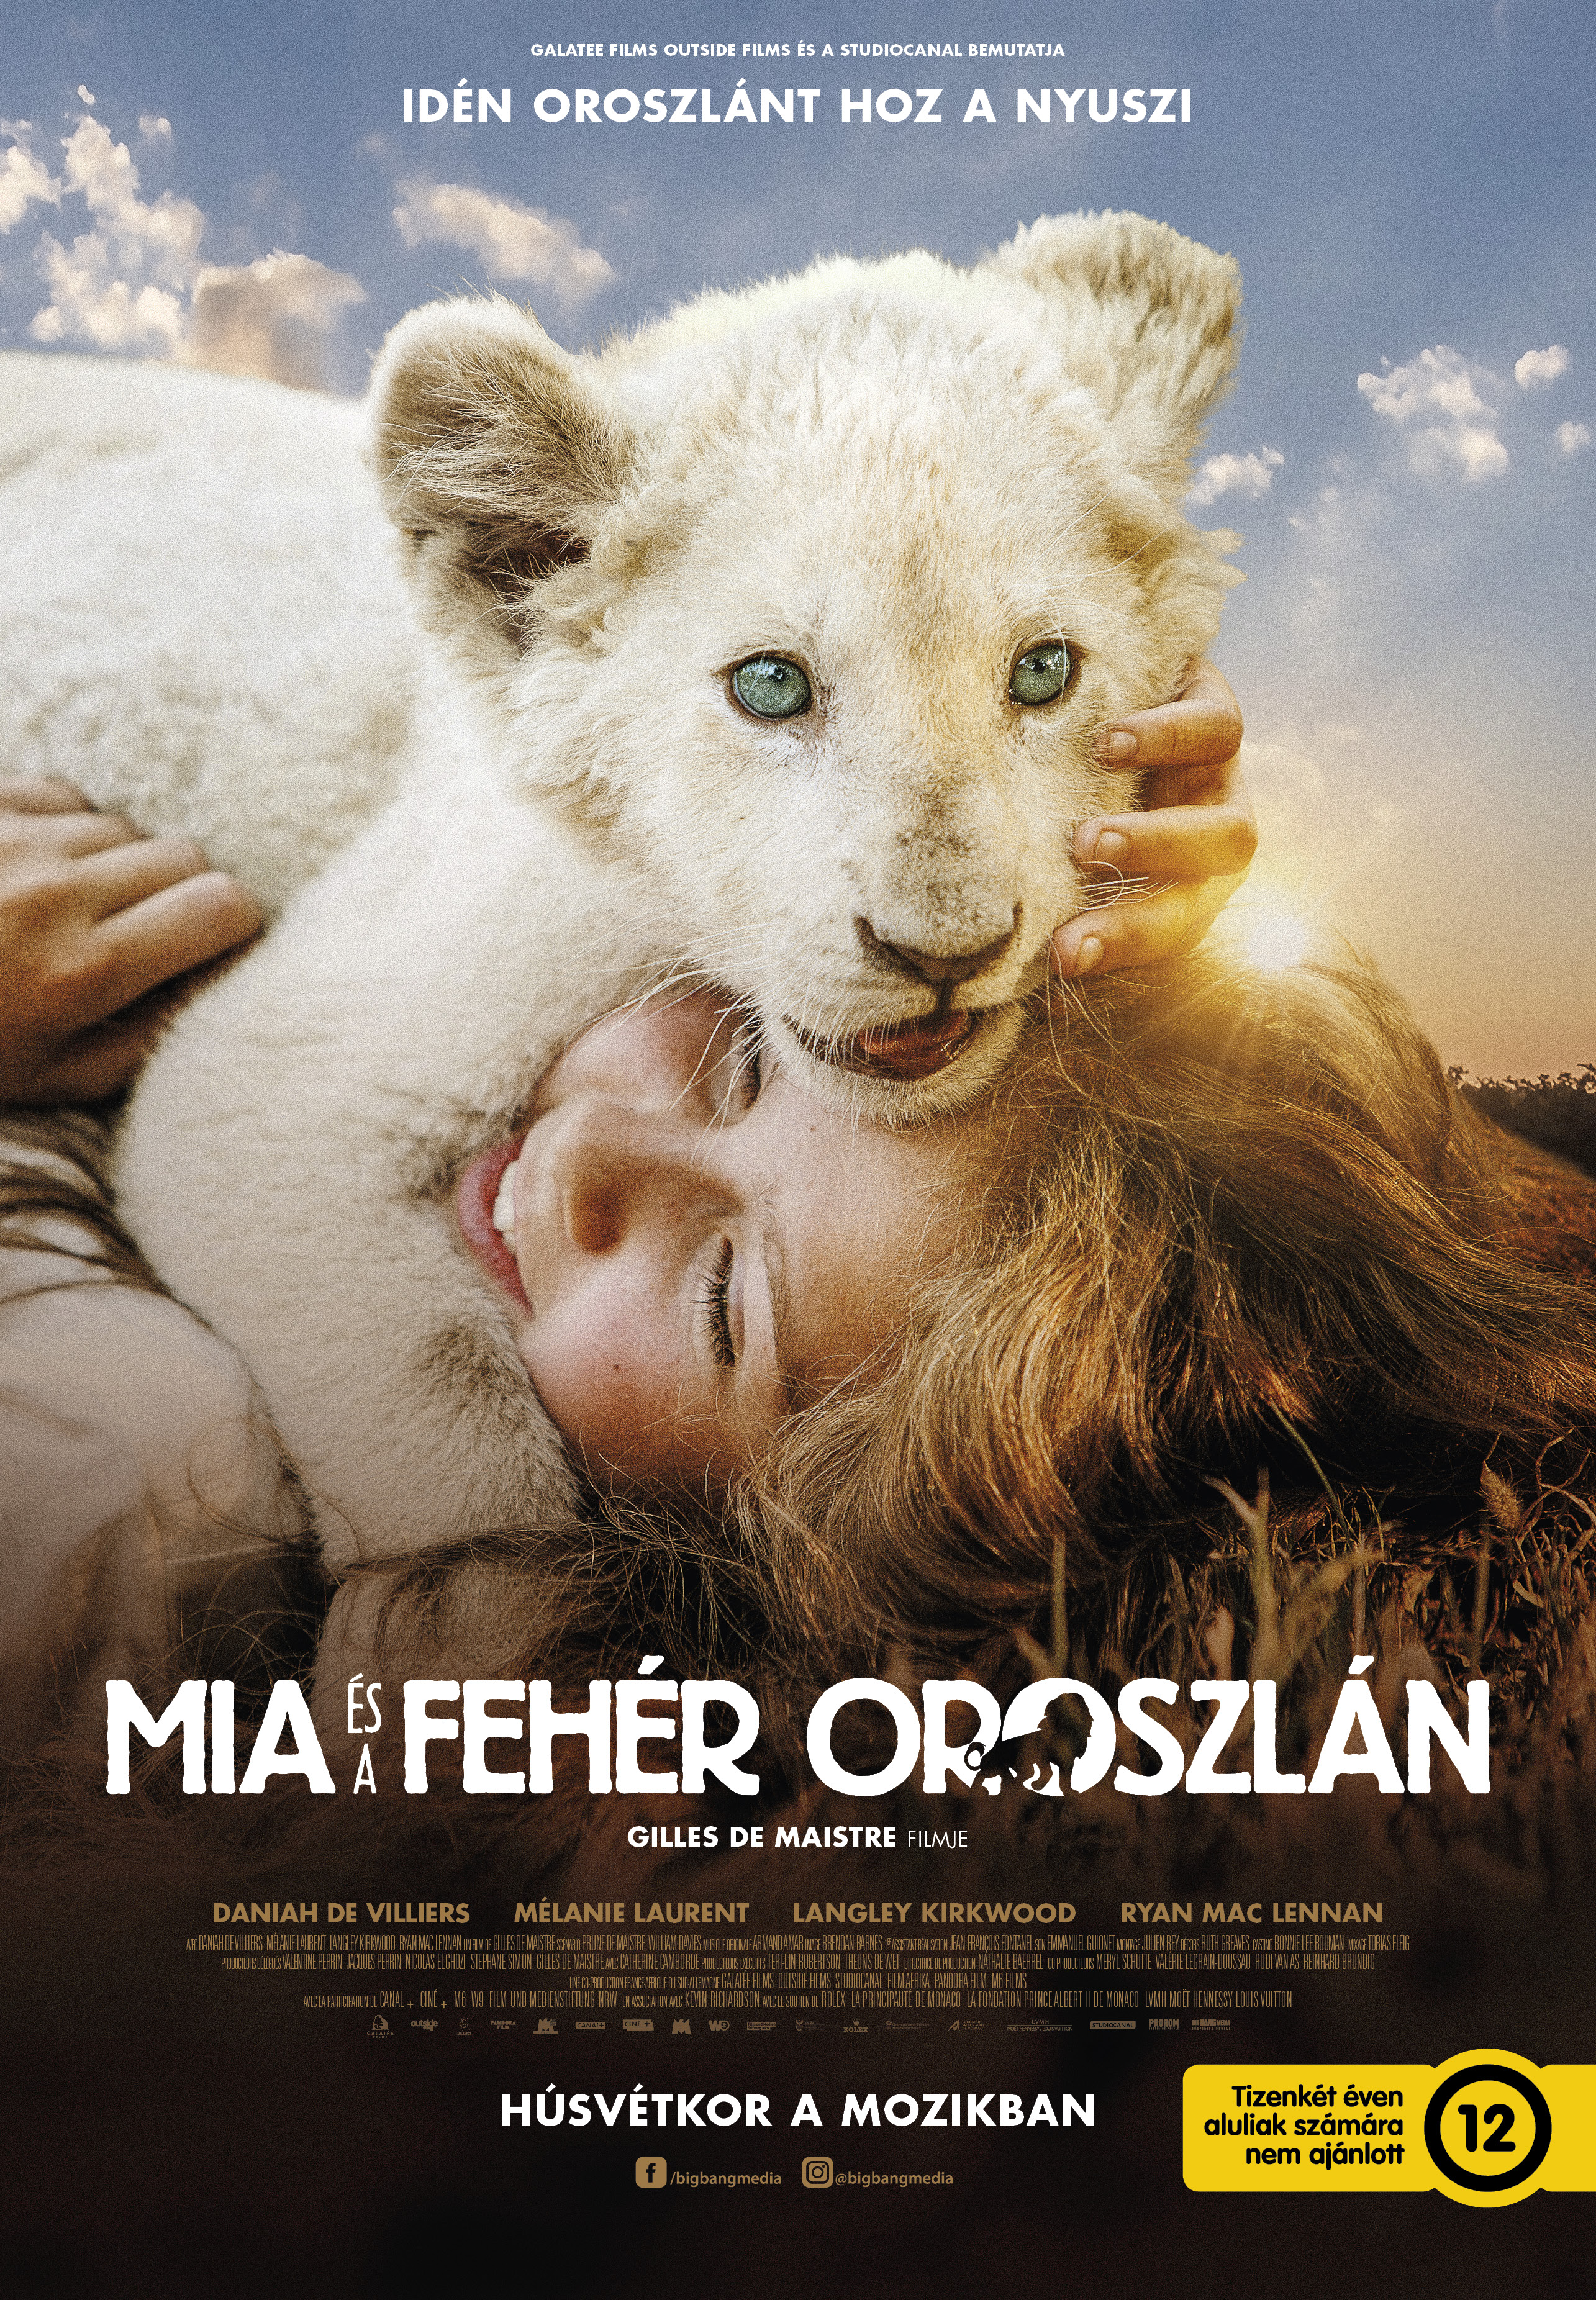 Mia.es.a.feher.oroszlan.2018.BRRip.x264.MD.HUN-RolandS